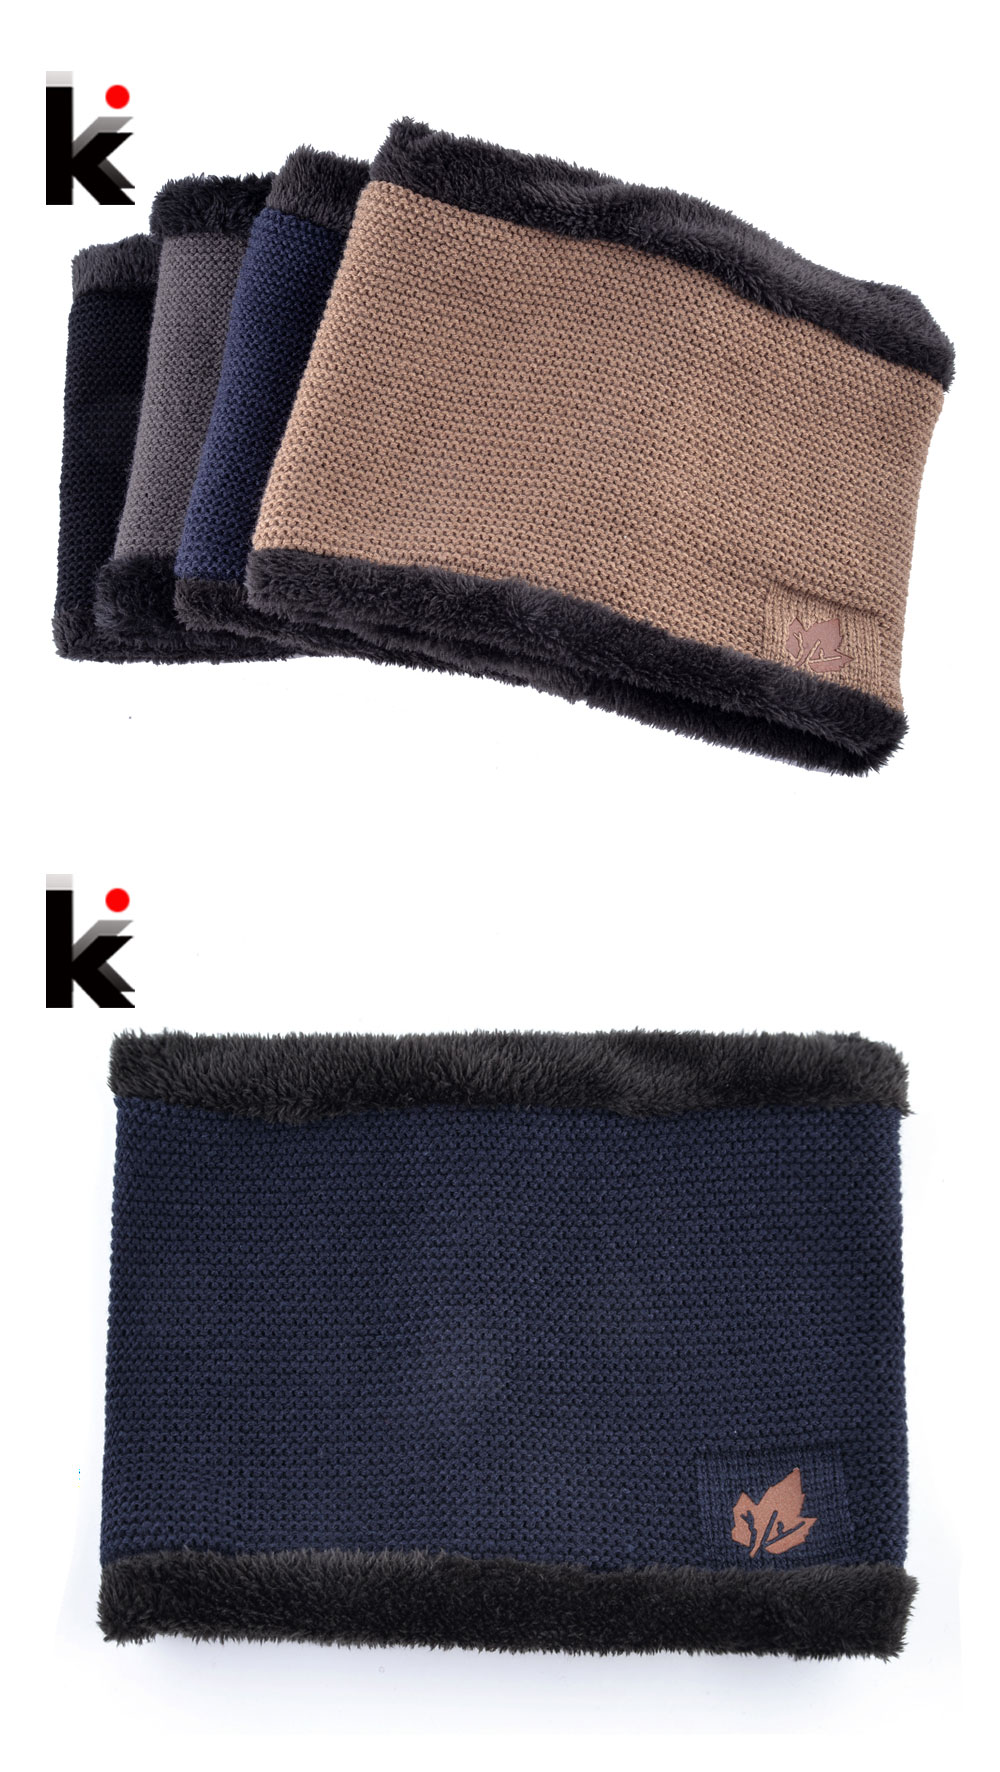 1746f90a590 2018 Men Winter Hat Scarf Sets Fashion Maple Leaf Knitted Skullies Beanies  Man Thick Add Velvet Knit Bonnet Cap Boys Scarves Set. K 01 K 02 K 03 ...